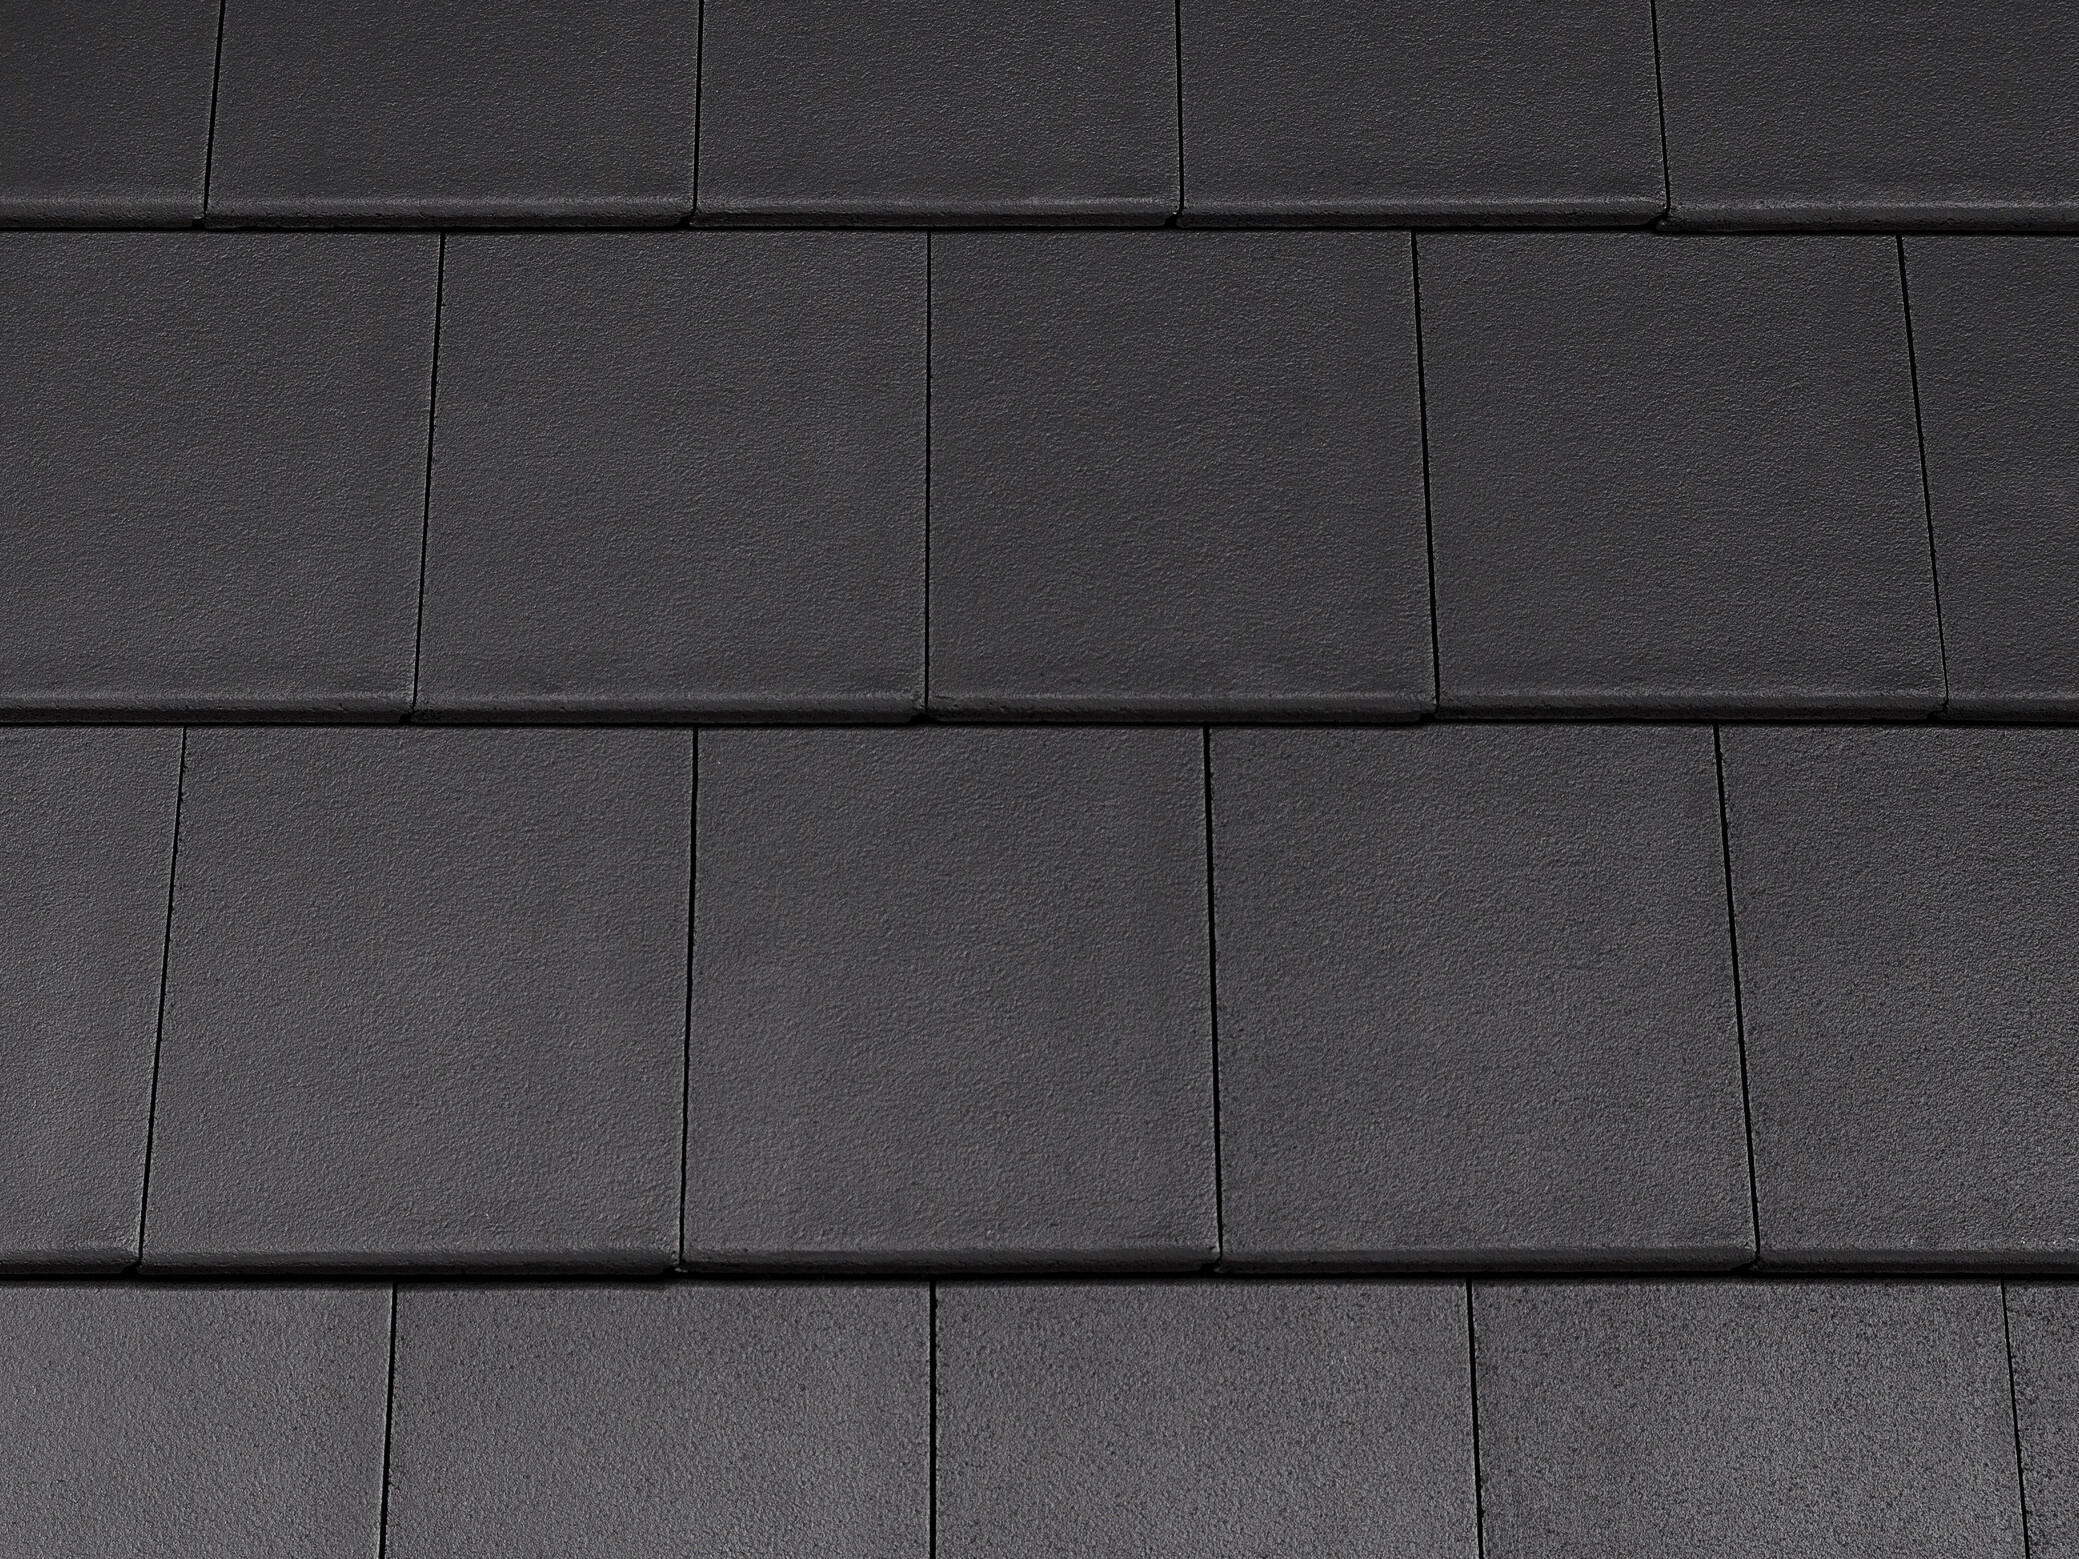 KAPSTADT - Плоска цементна черепиця